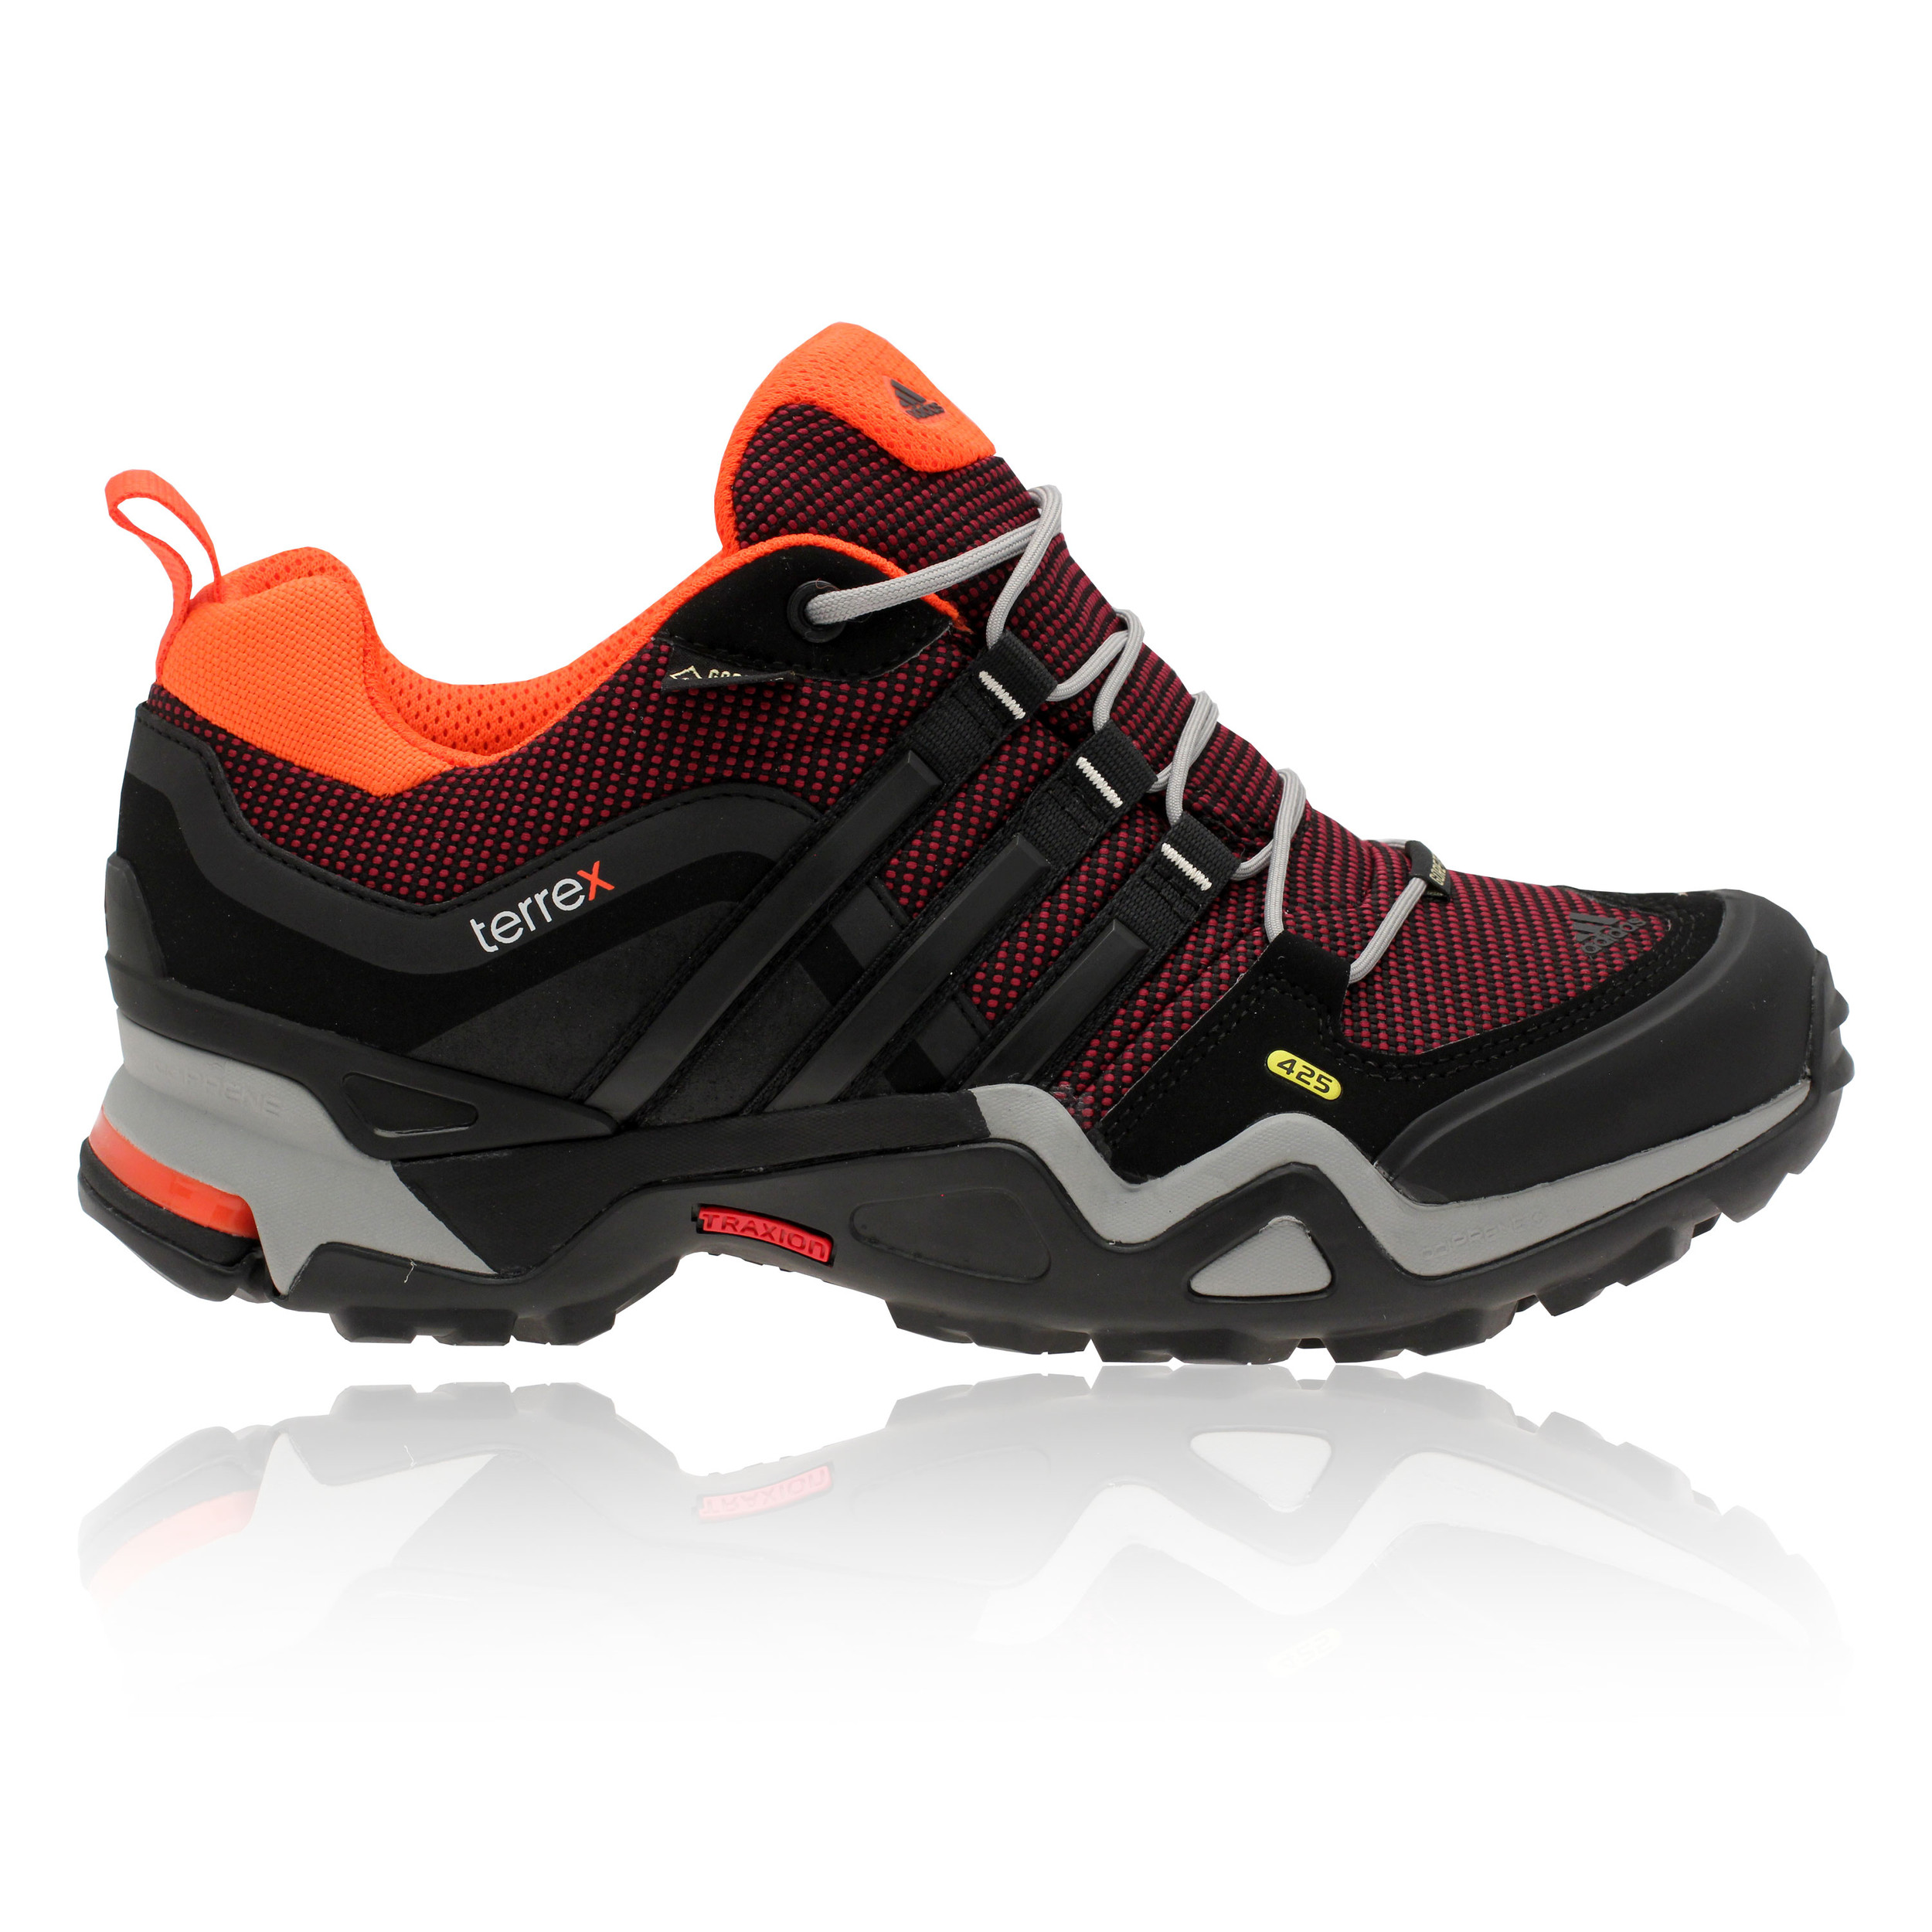 adidas terrex fast x tex trail s walking shoes